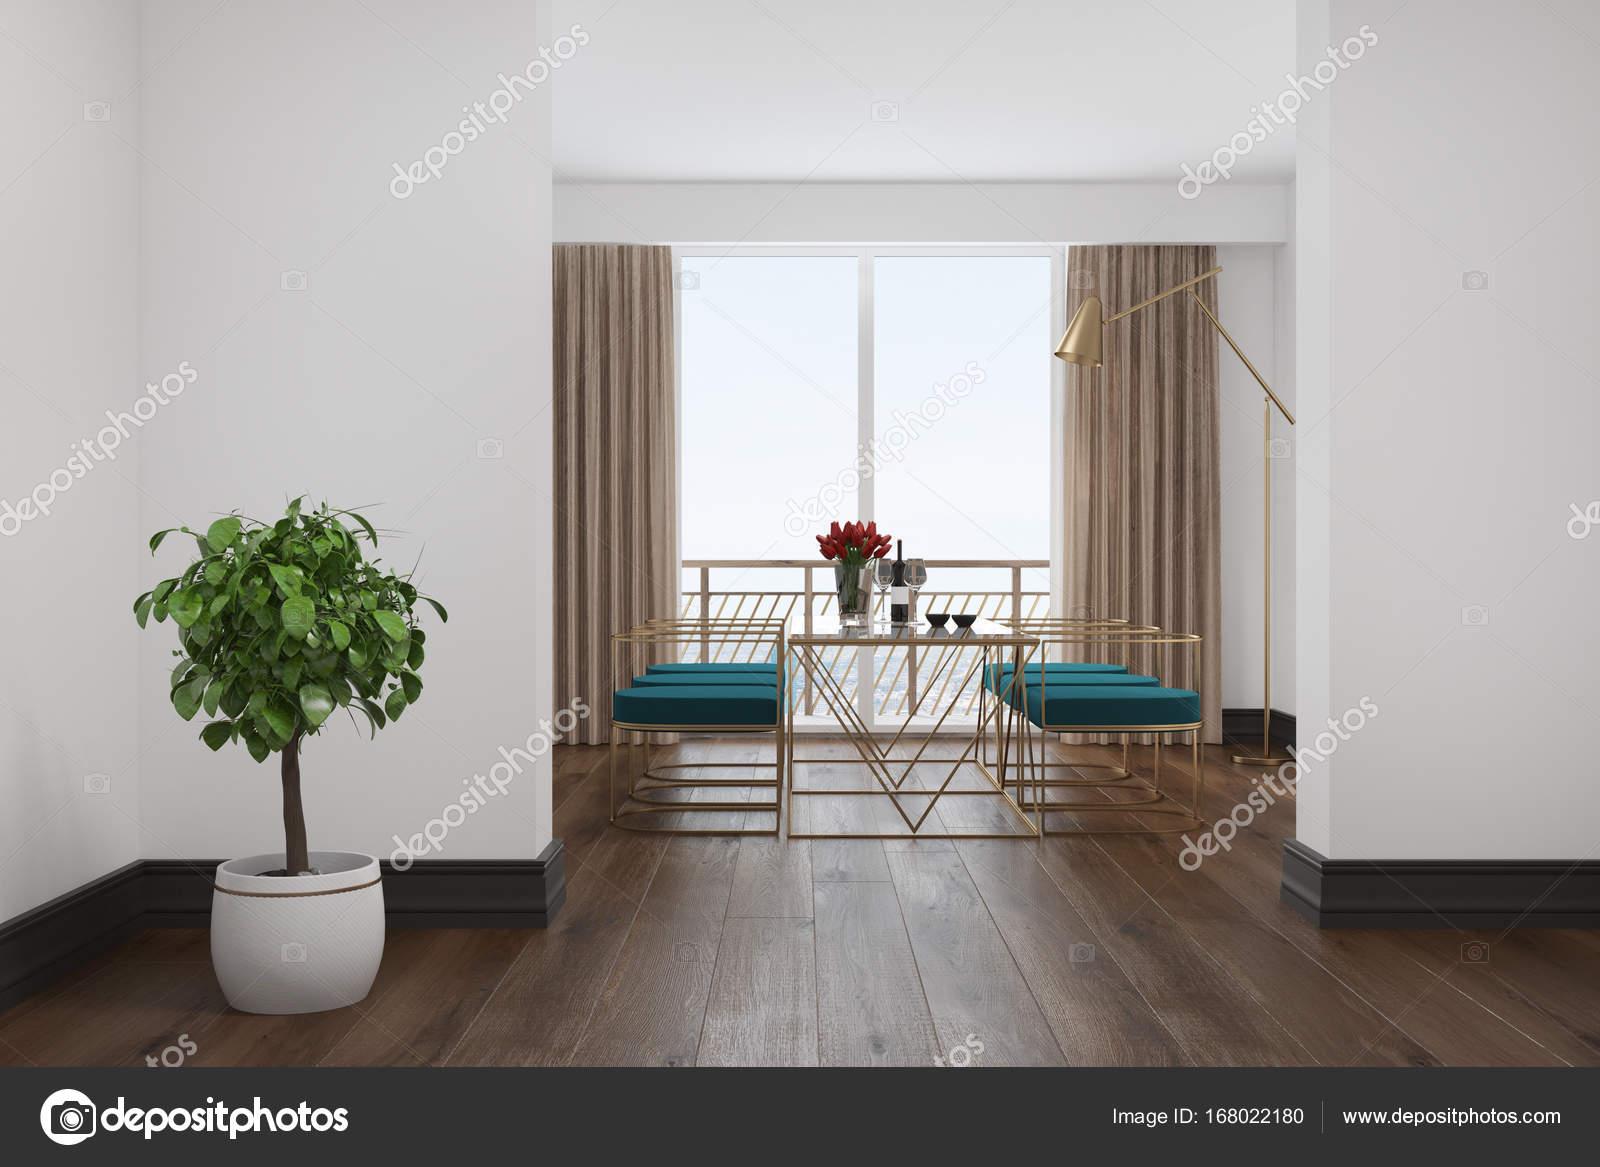 Wit interieur blauwe stoelen van eetkamer u stockfoto